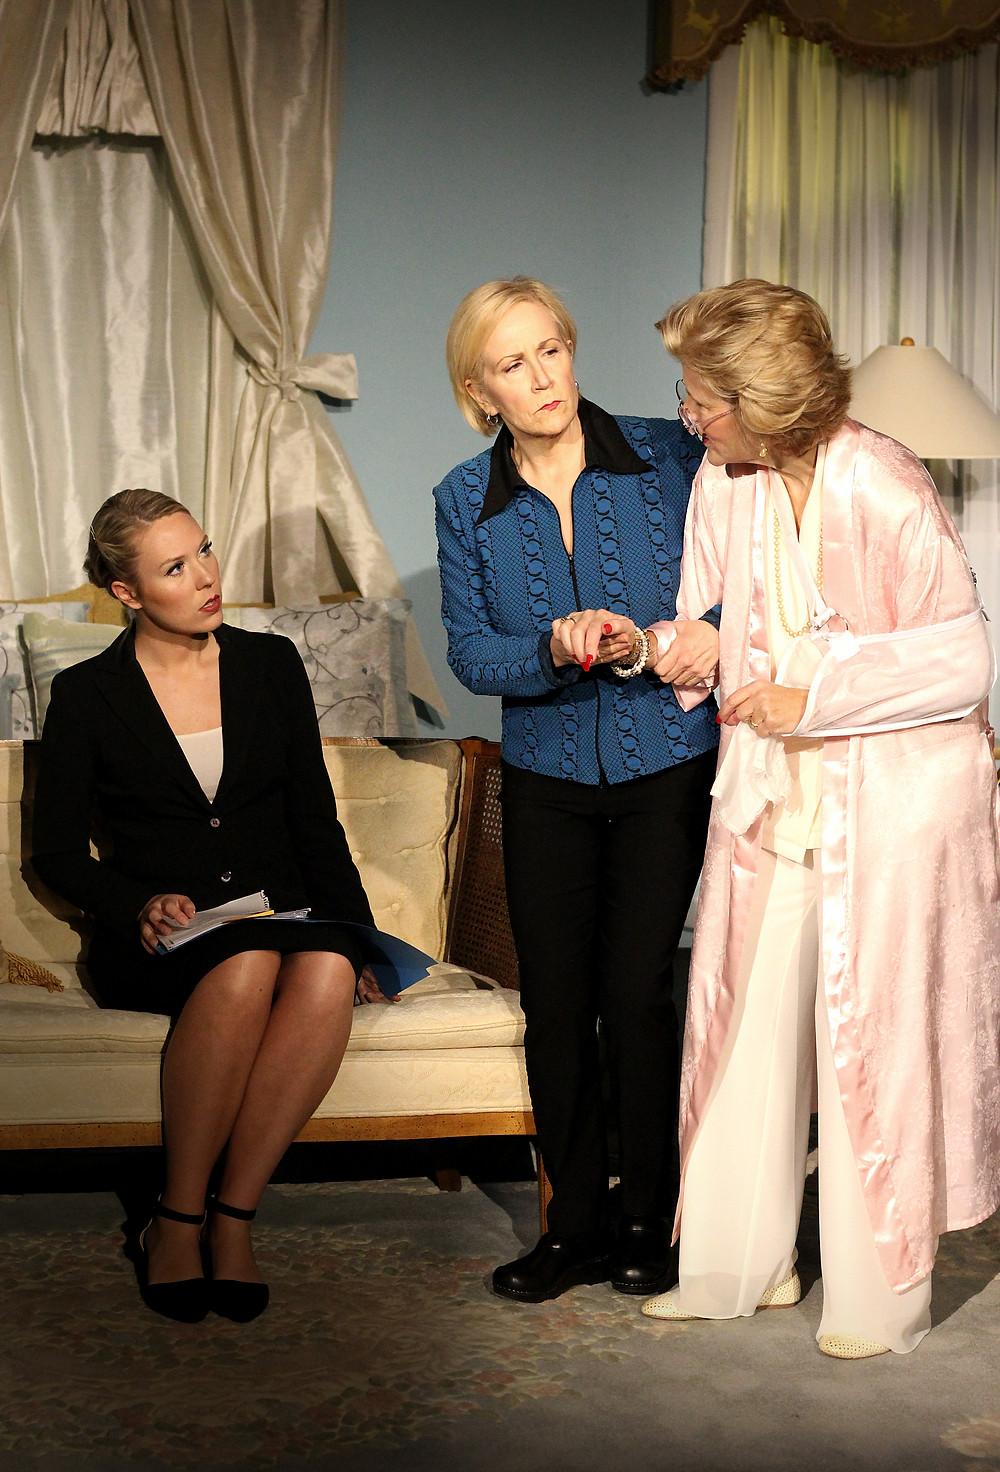 Langley Cornwell as Woman B in Three Tall Women. Photo by Daniel Velasco.